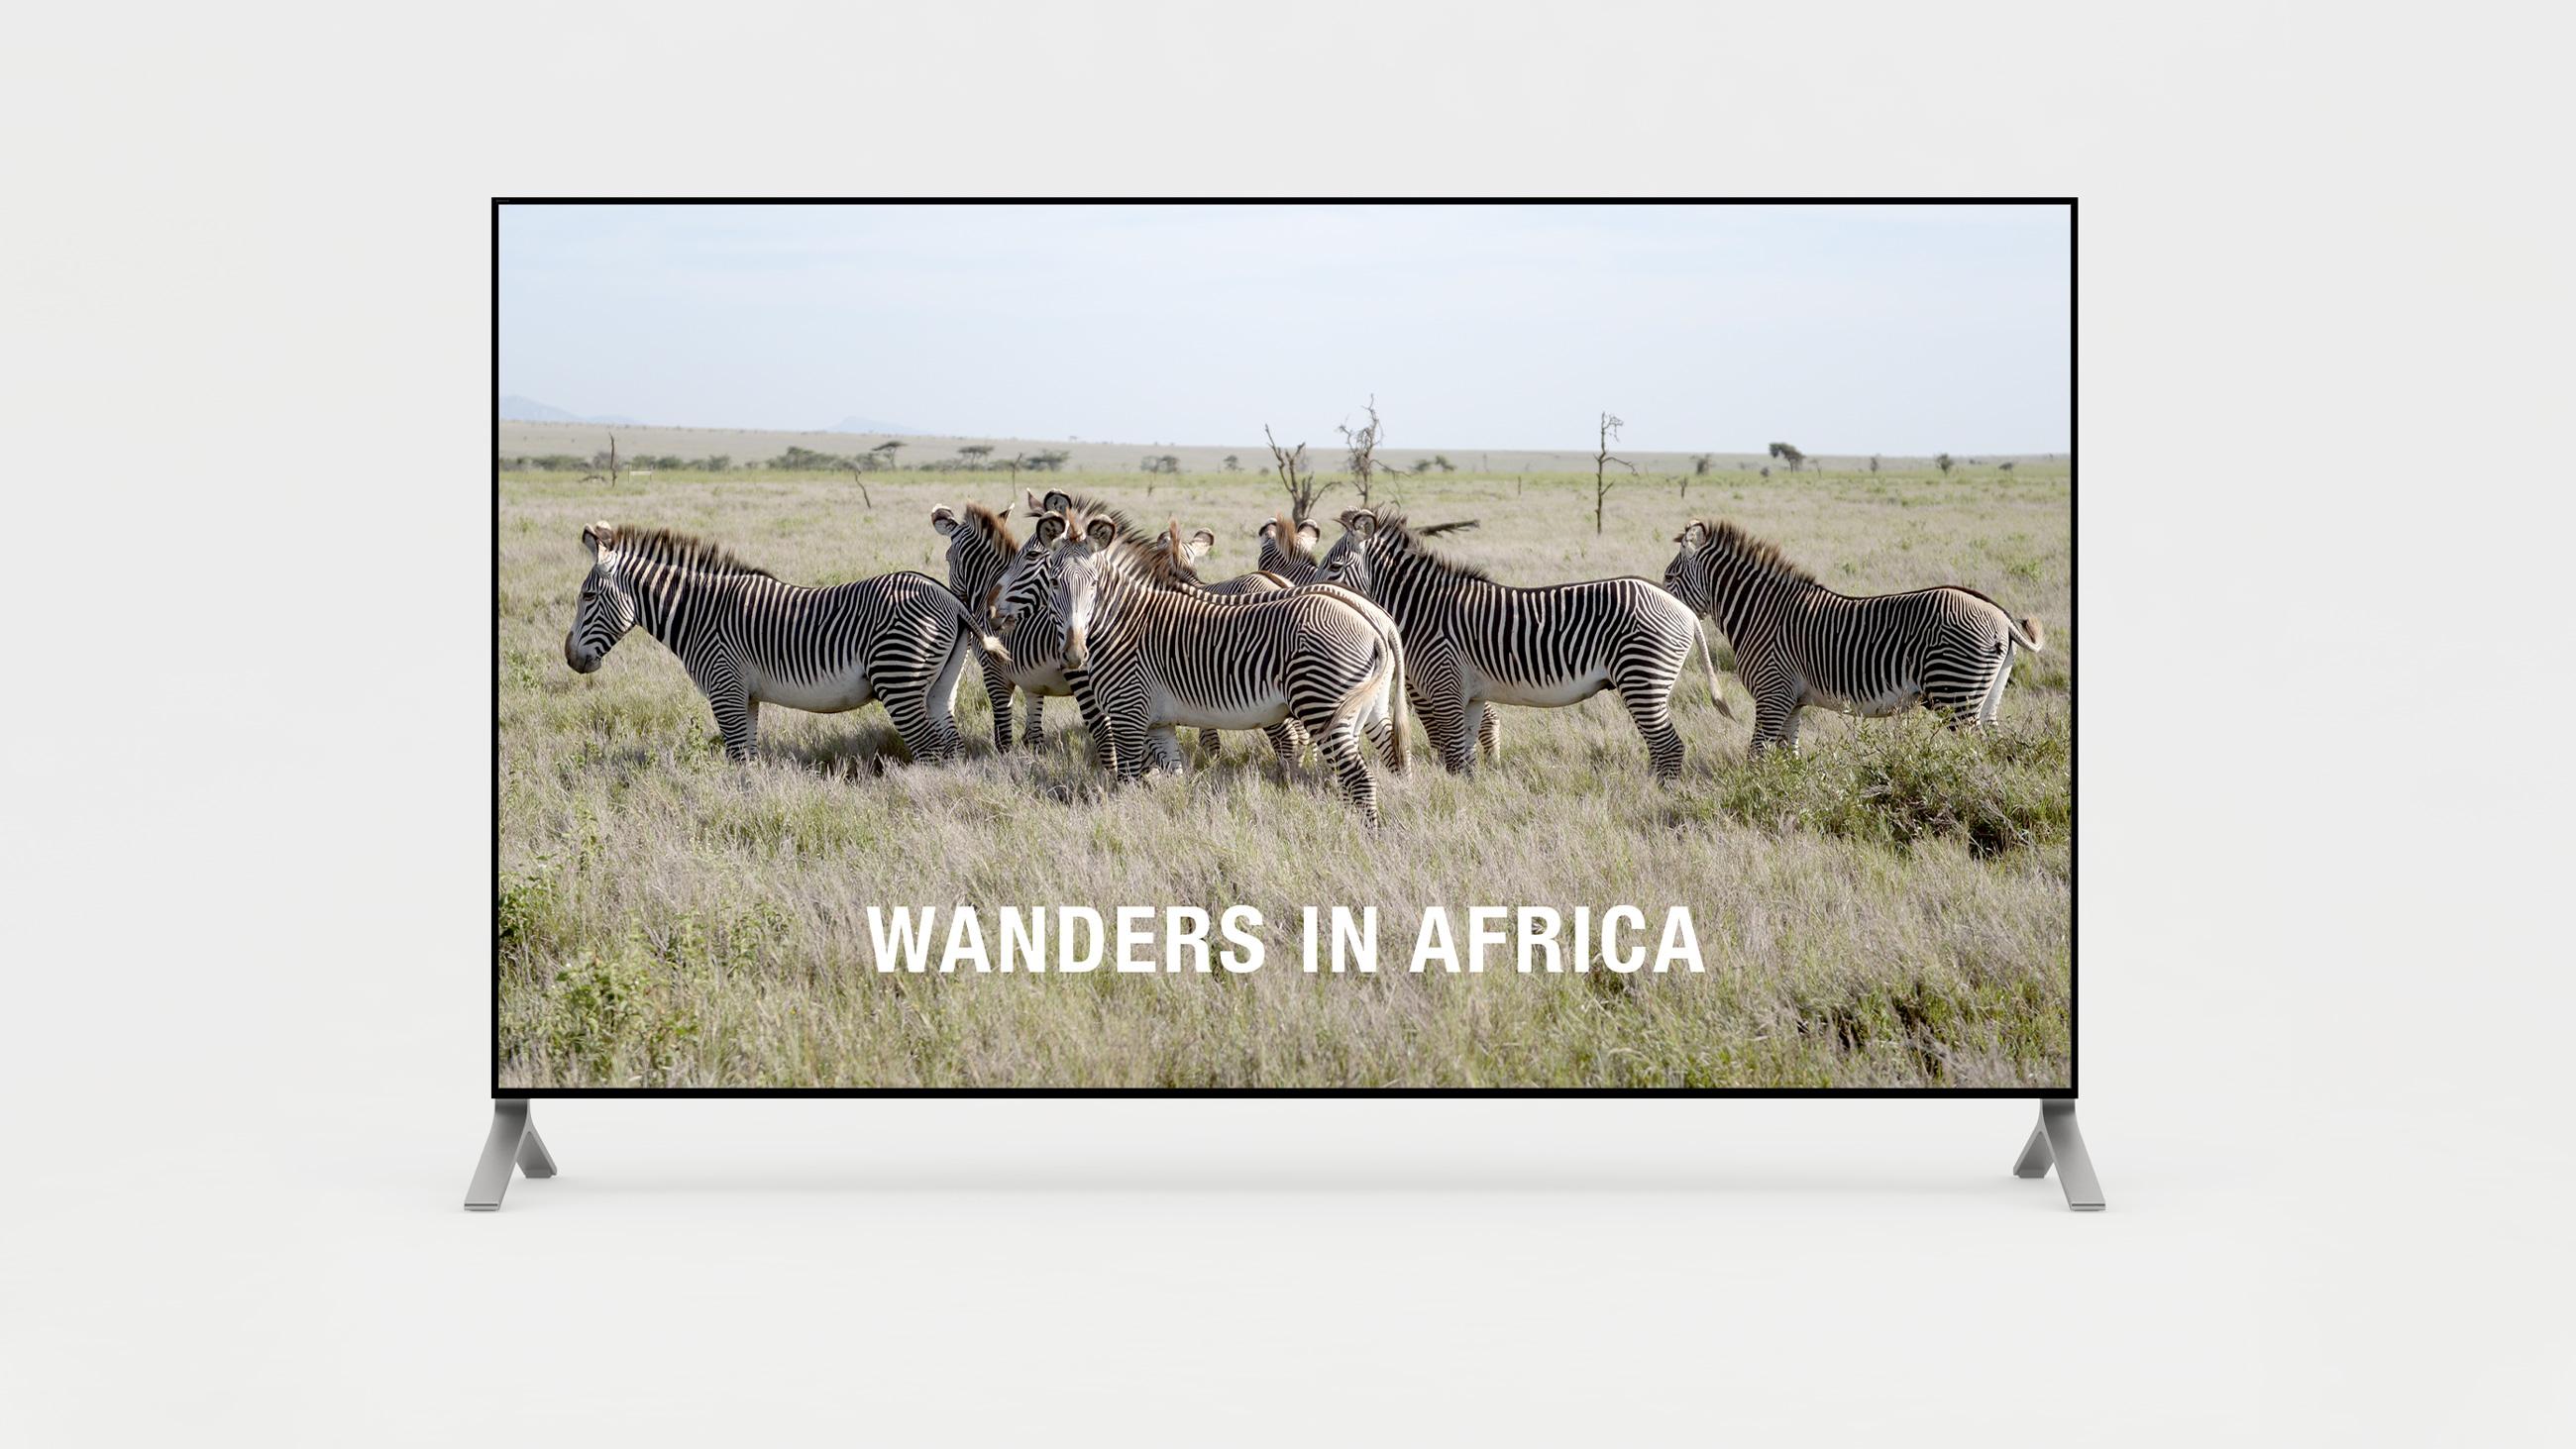 Short film of wanders in Africa